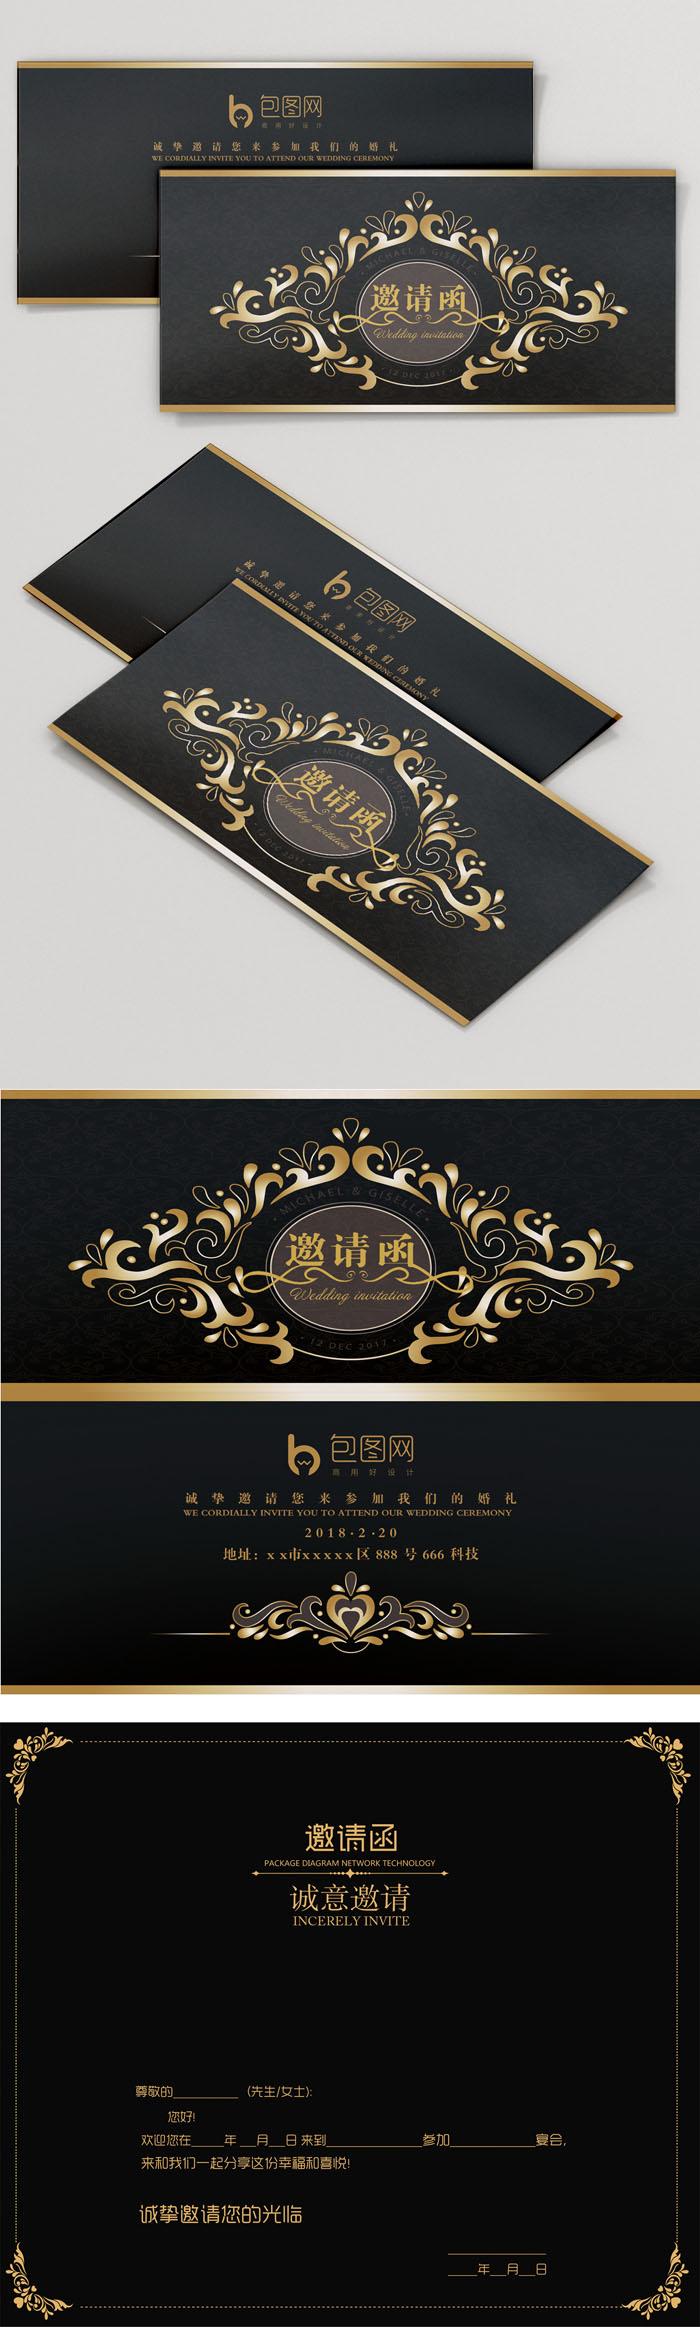 Black and Gold Fashion Wedding Invitation